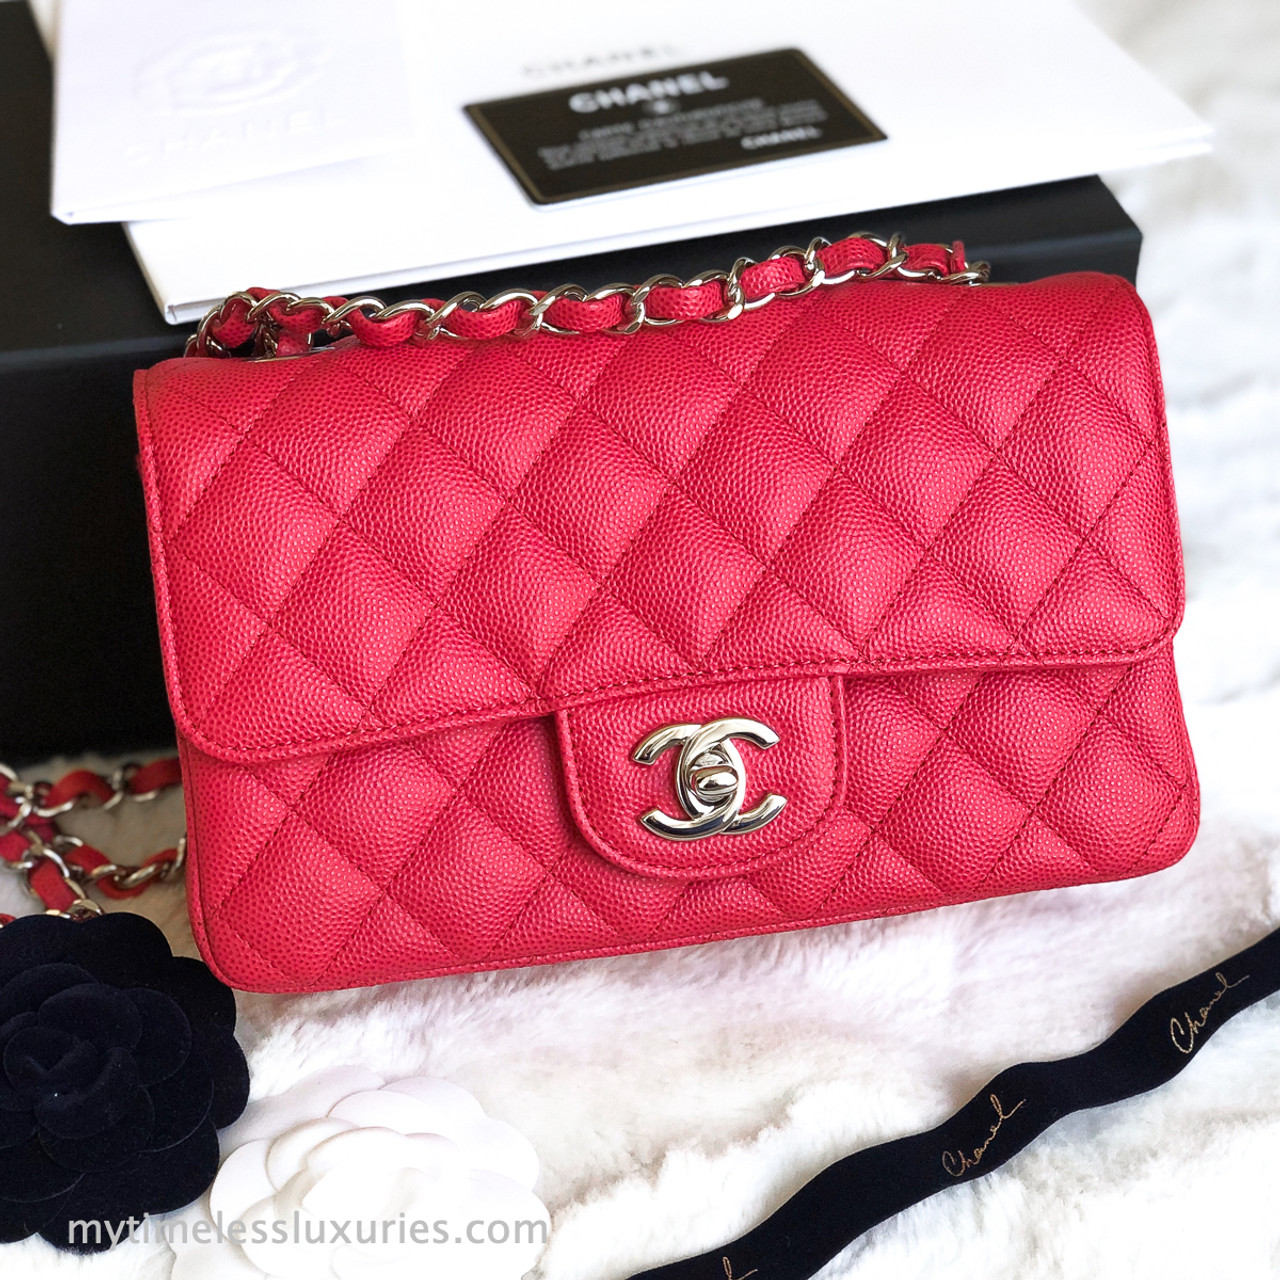 Handbag Review Chanel Classic Square Mini Vs Chanel Reissue Mini Maddy Loves